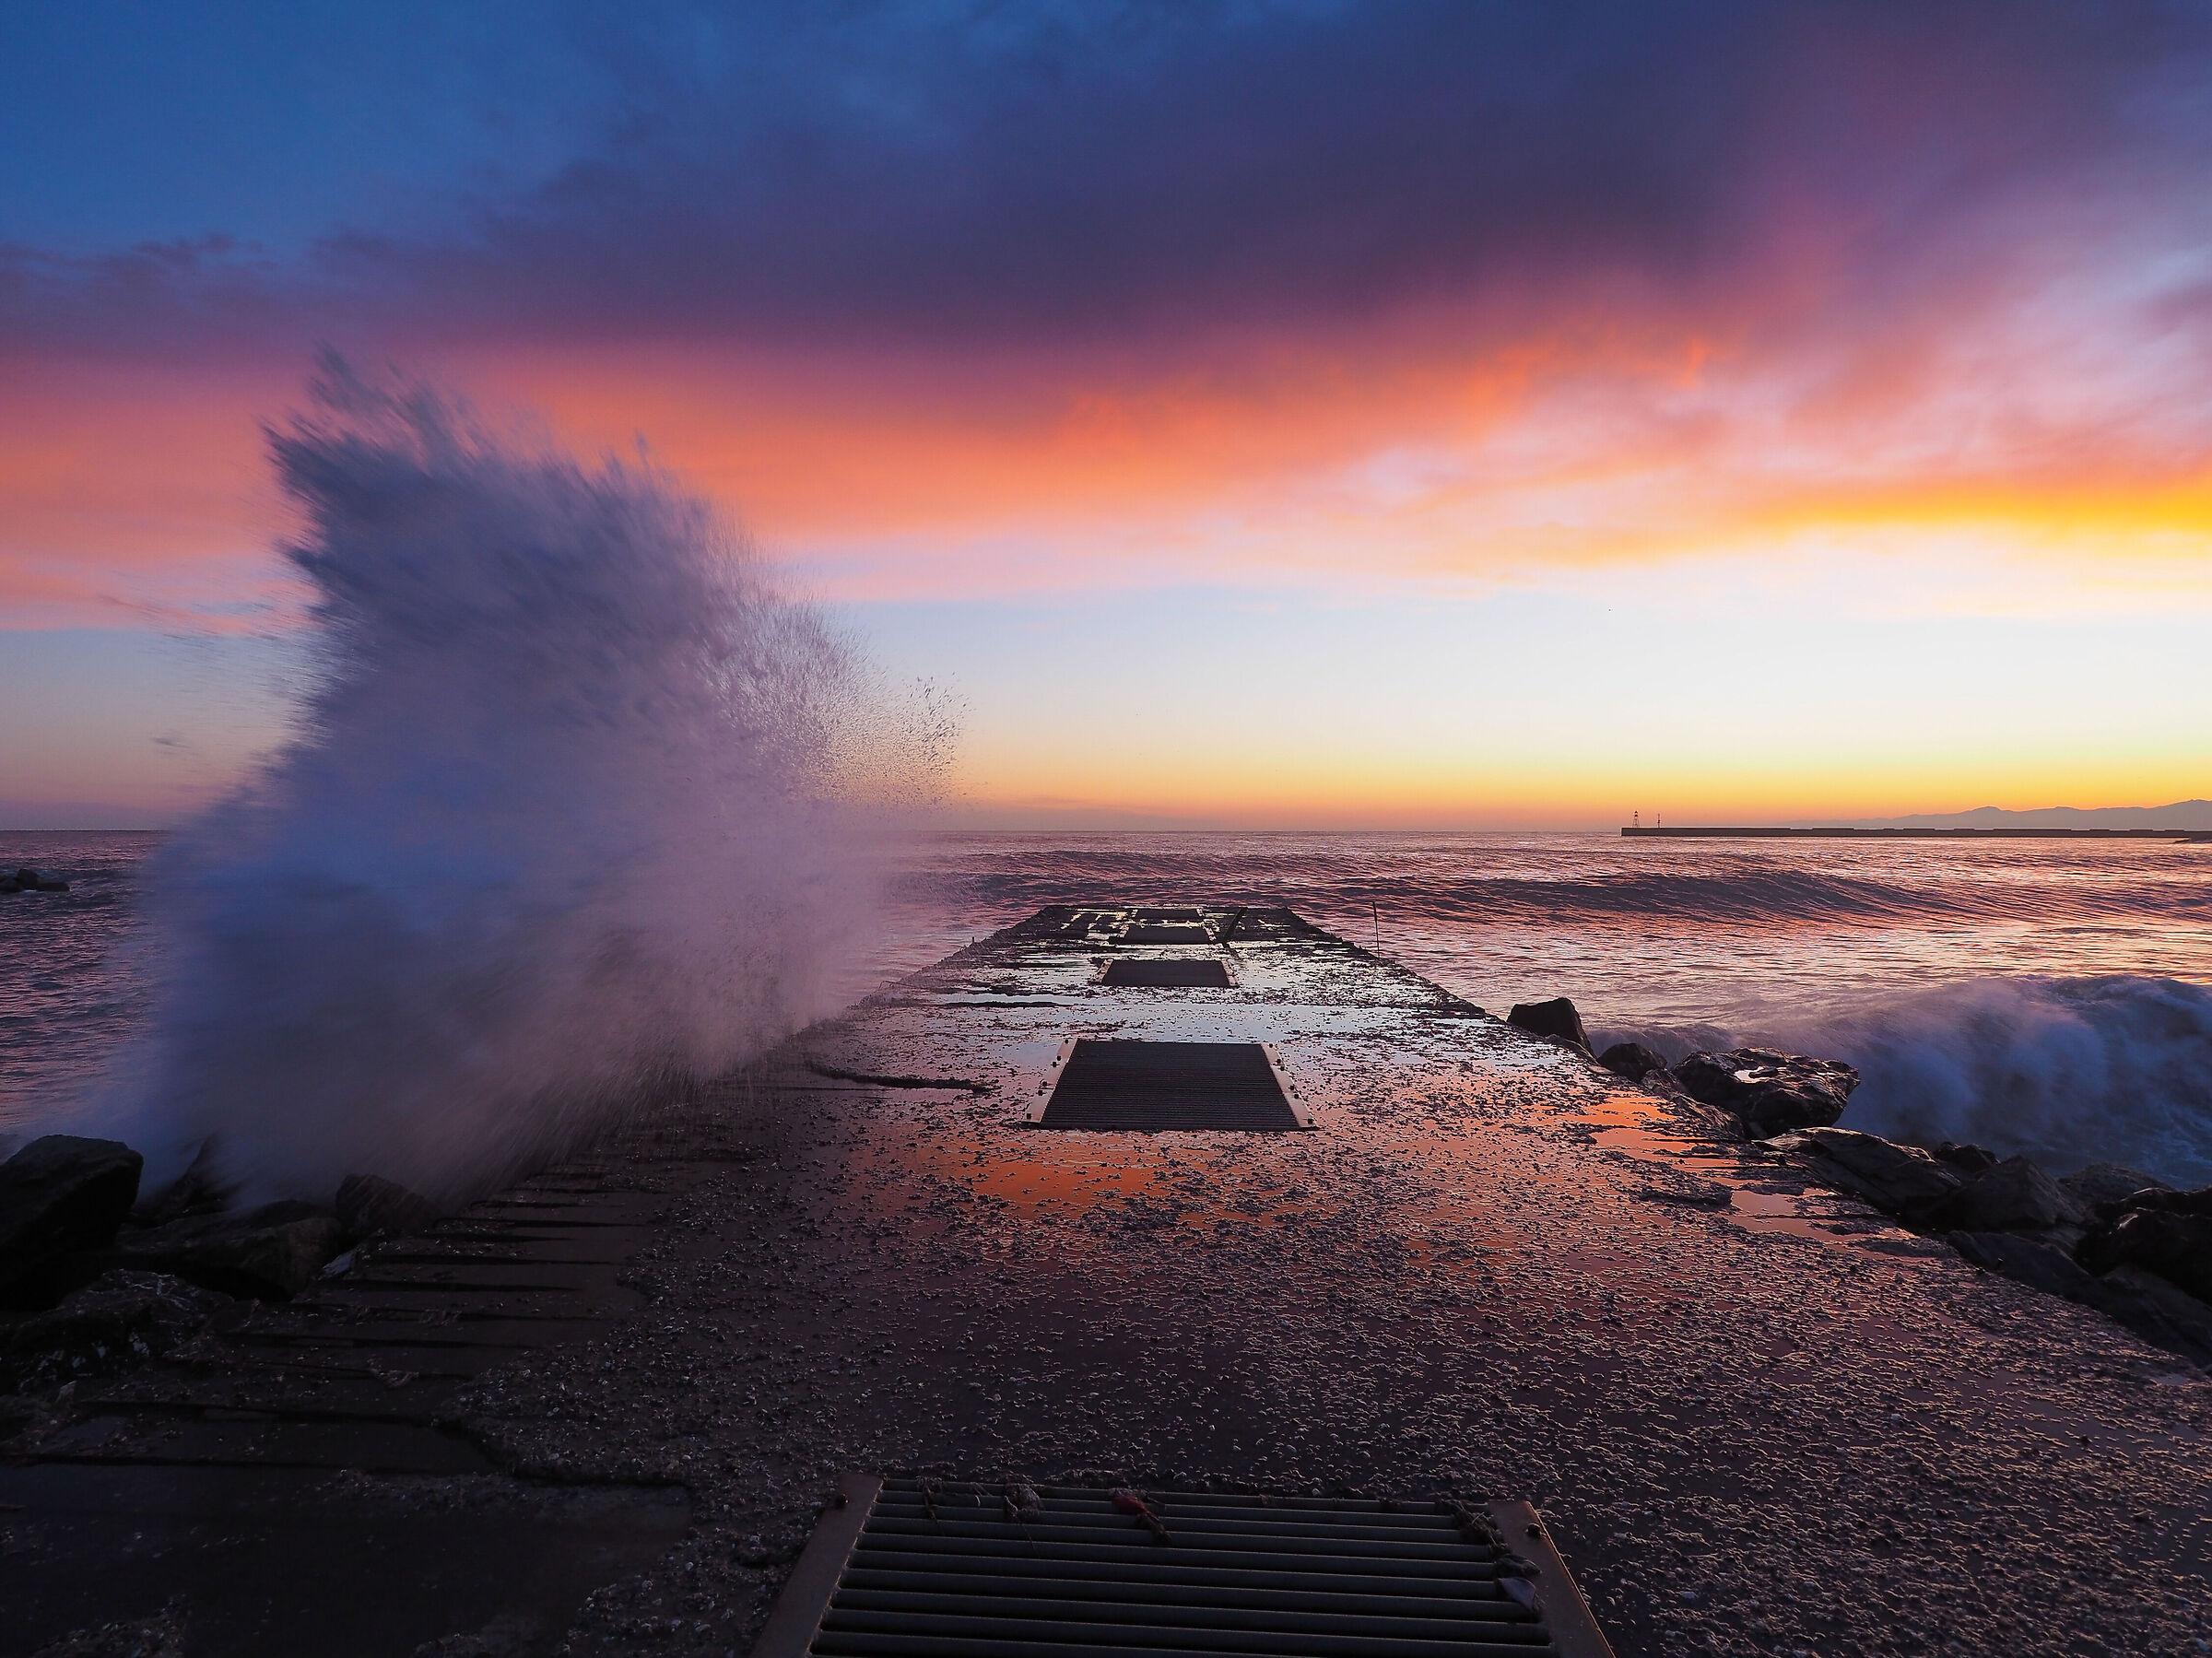 Sunset at Punta Vagno (Genoa)...